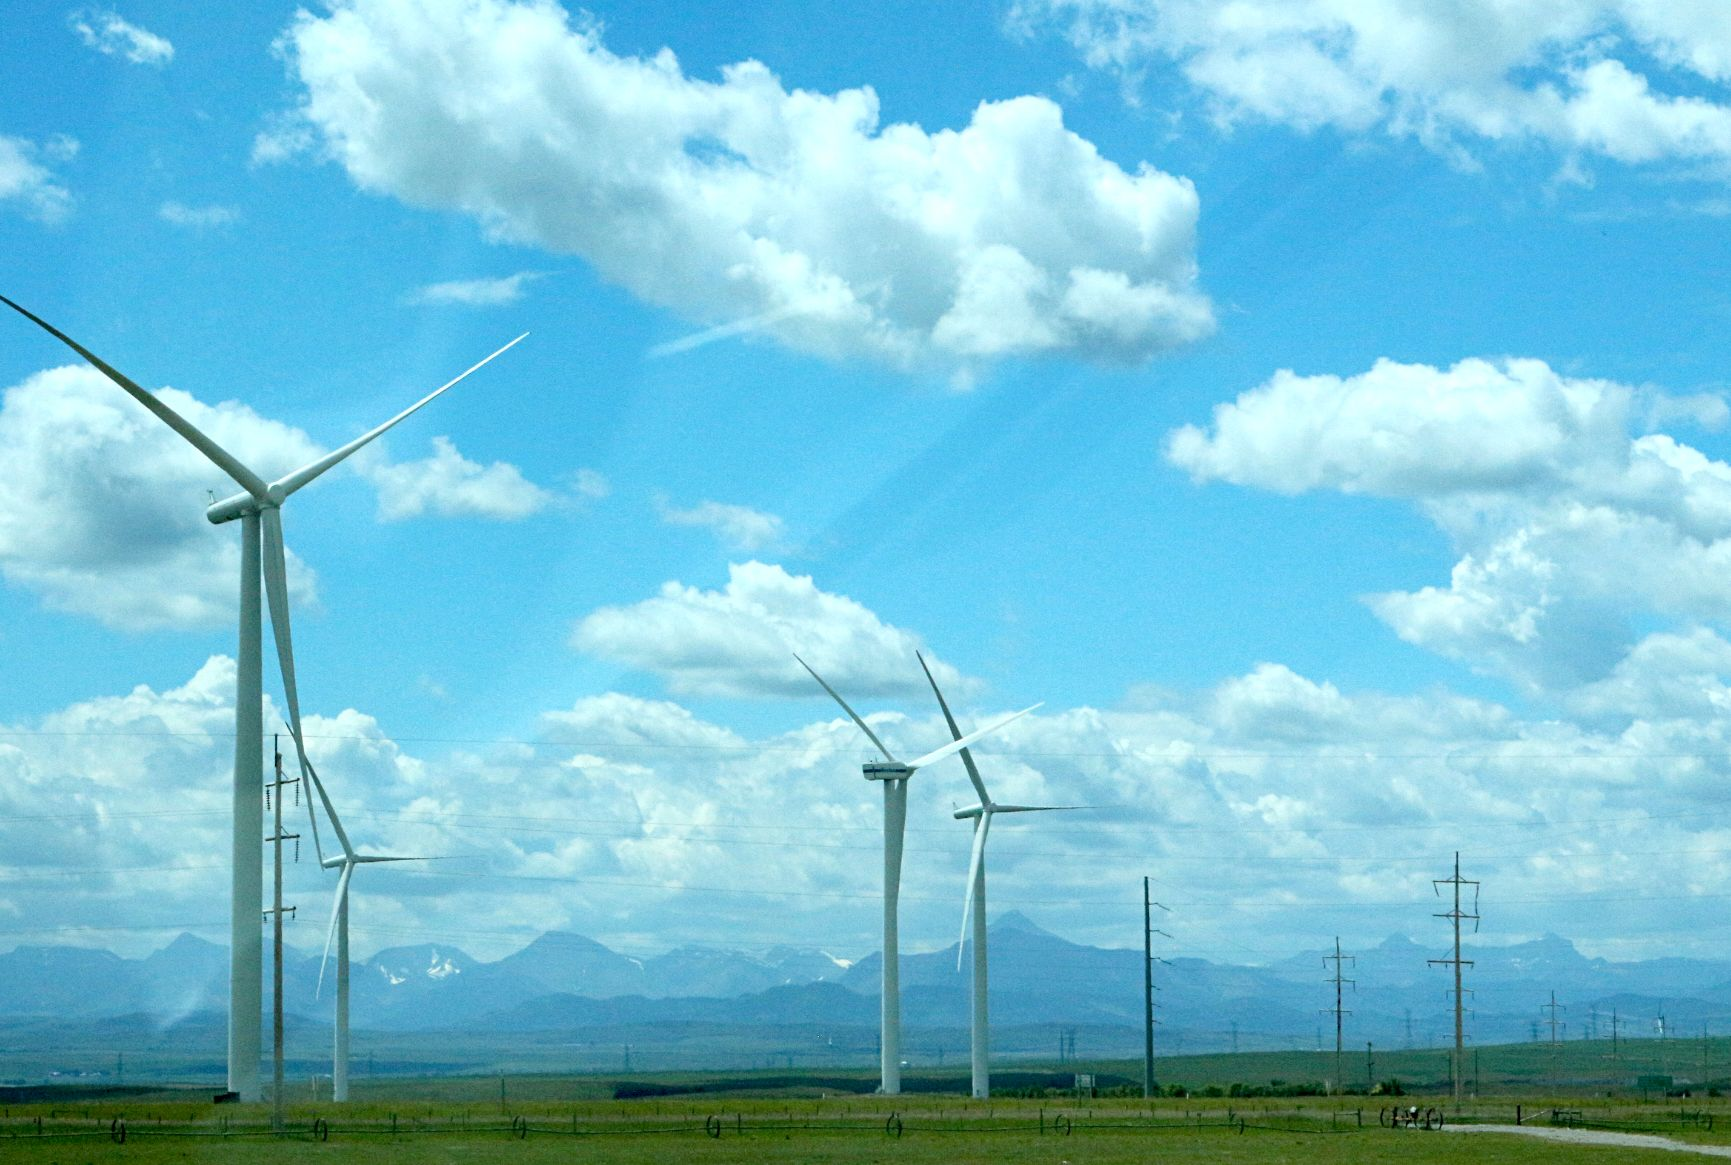 Wind Power Crowsnest Pass near Pincher Creek, Alberta